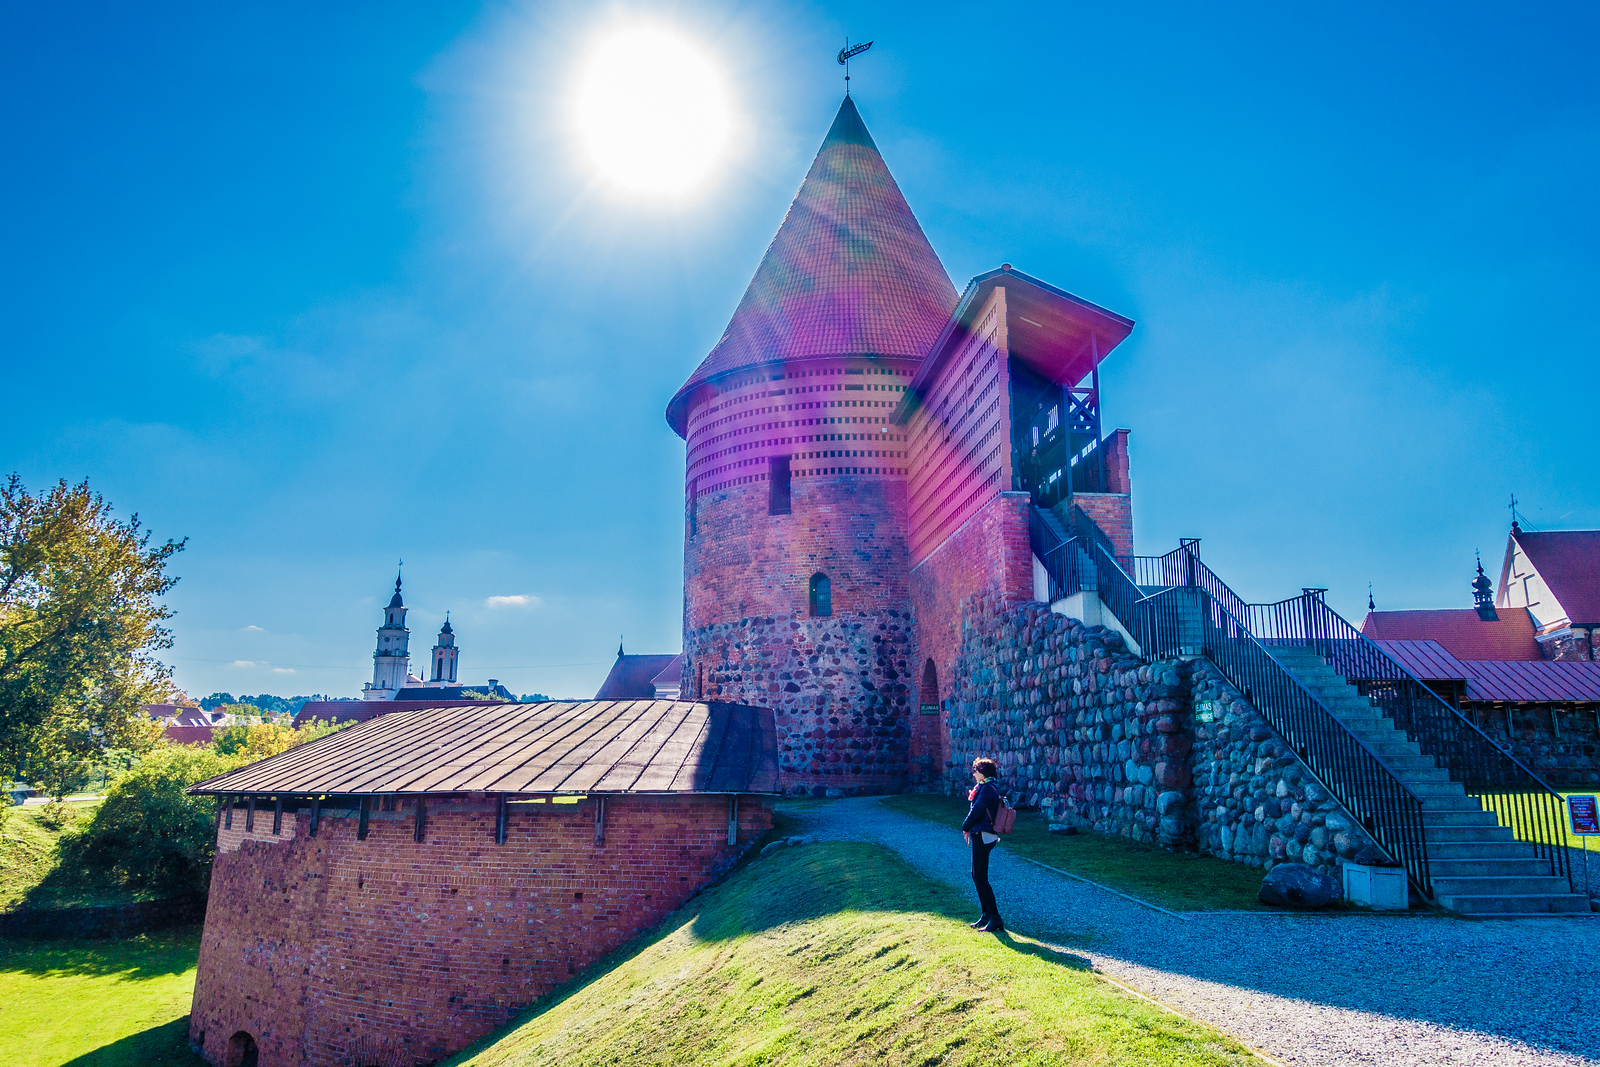 Lithuania Travel Guide - Kaunas Castle